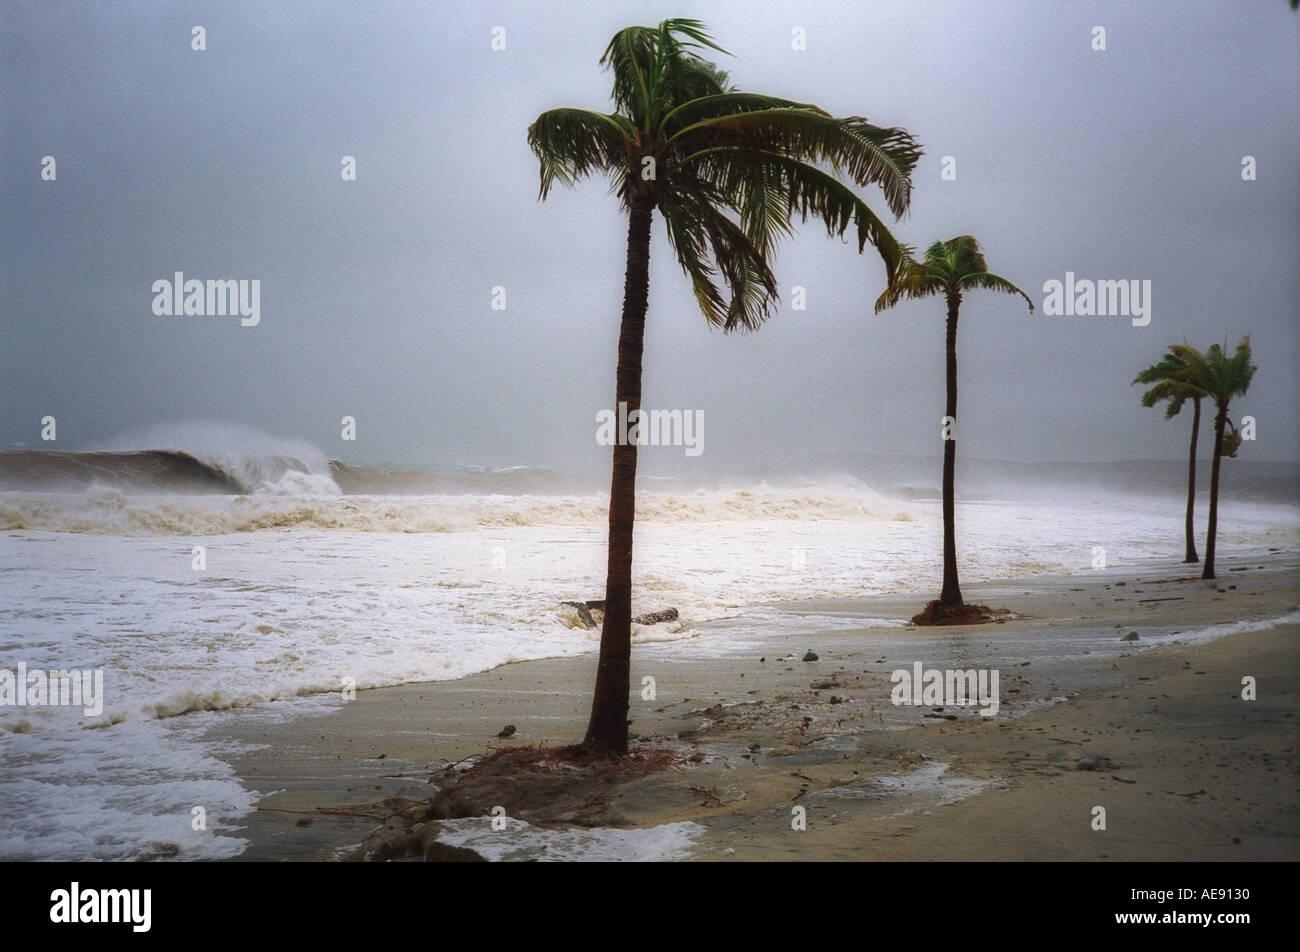 Strand bei Hurrikan in Baja California Mexiko Stockbild